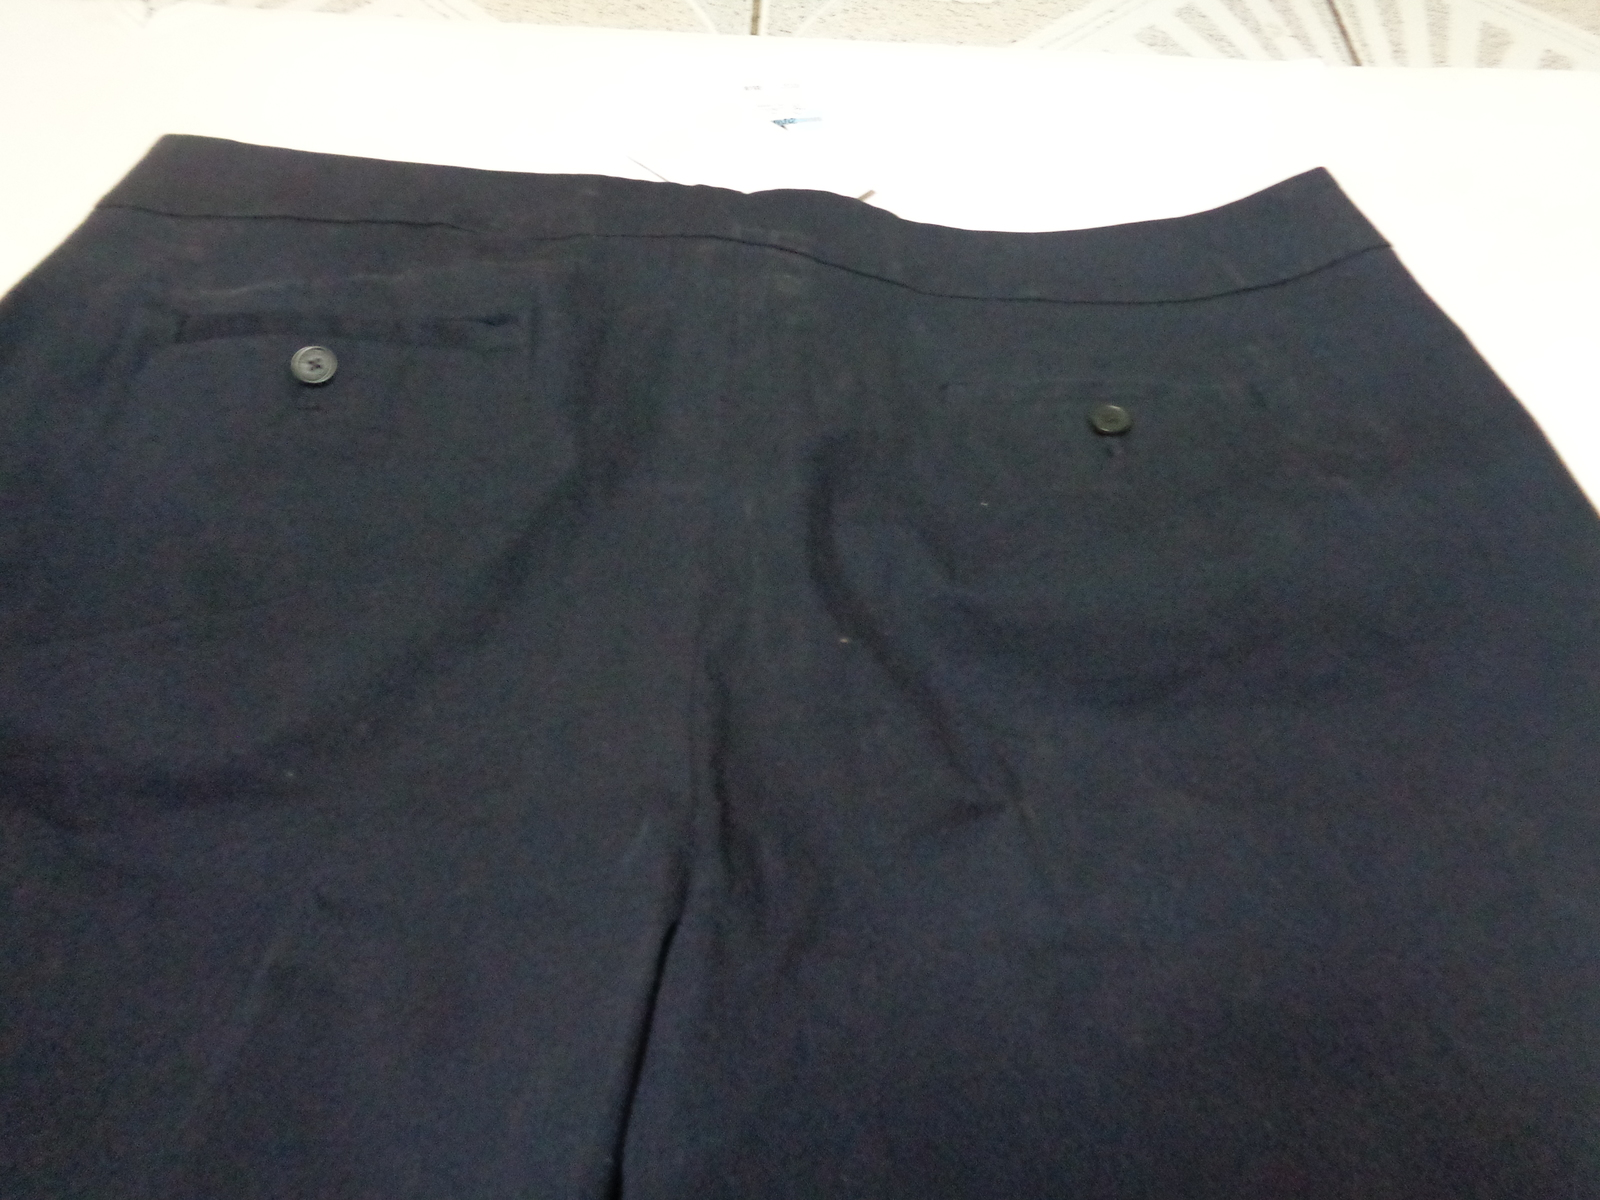 Jones New York Women's Navy Blue Shorts NWT SZ 20 Stretch